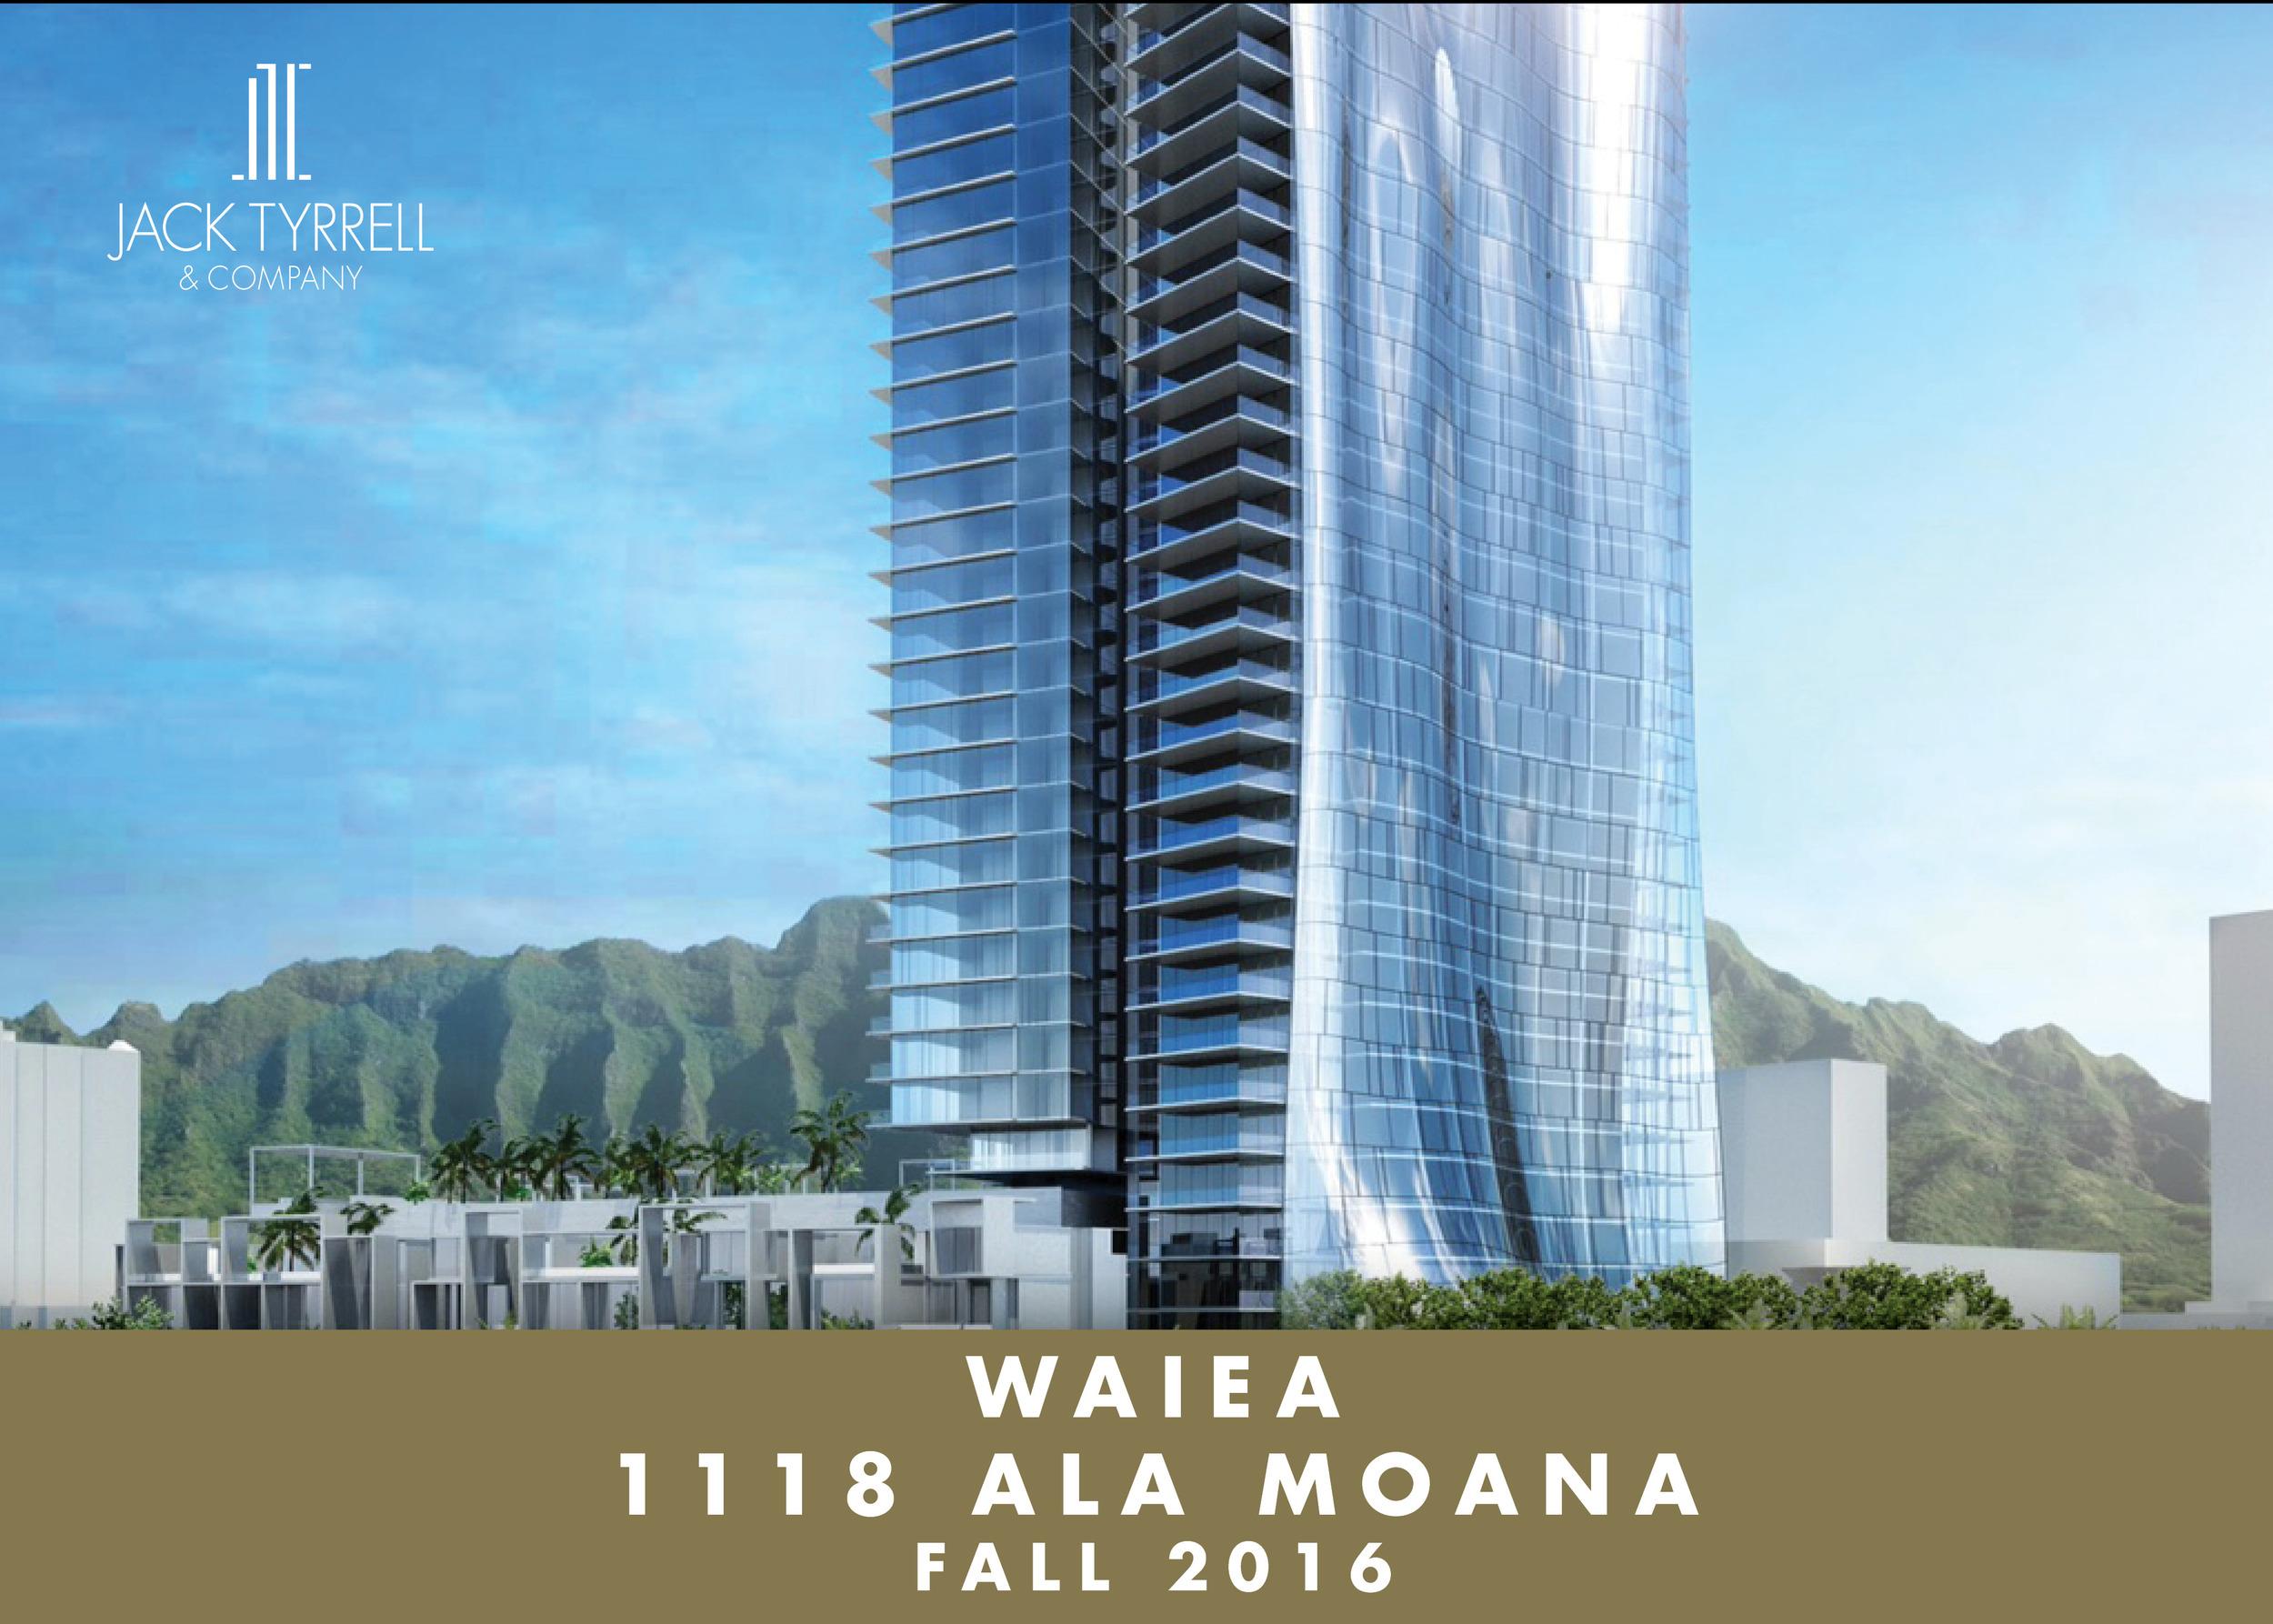 Howard Hughes new project Waiea - Est. Fall 2016